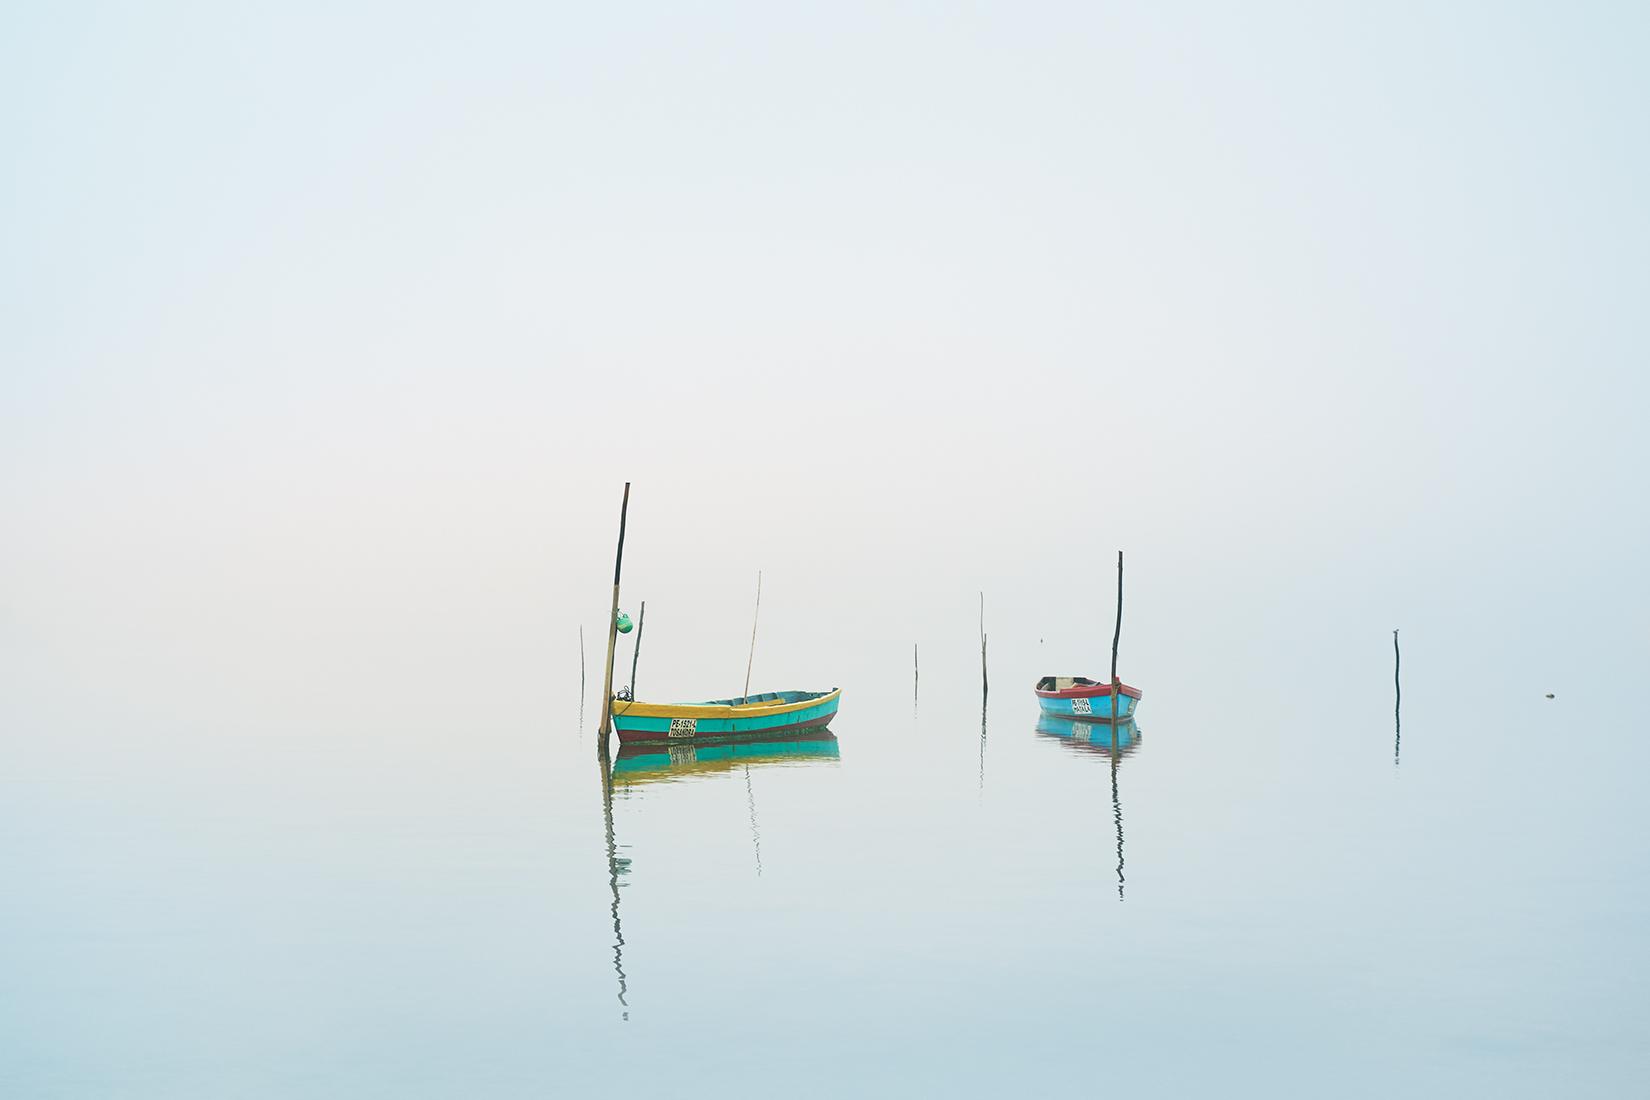 Fishermans Fog By Janine Graubaum